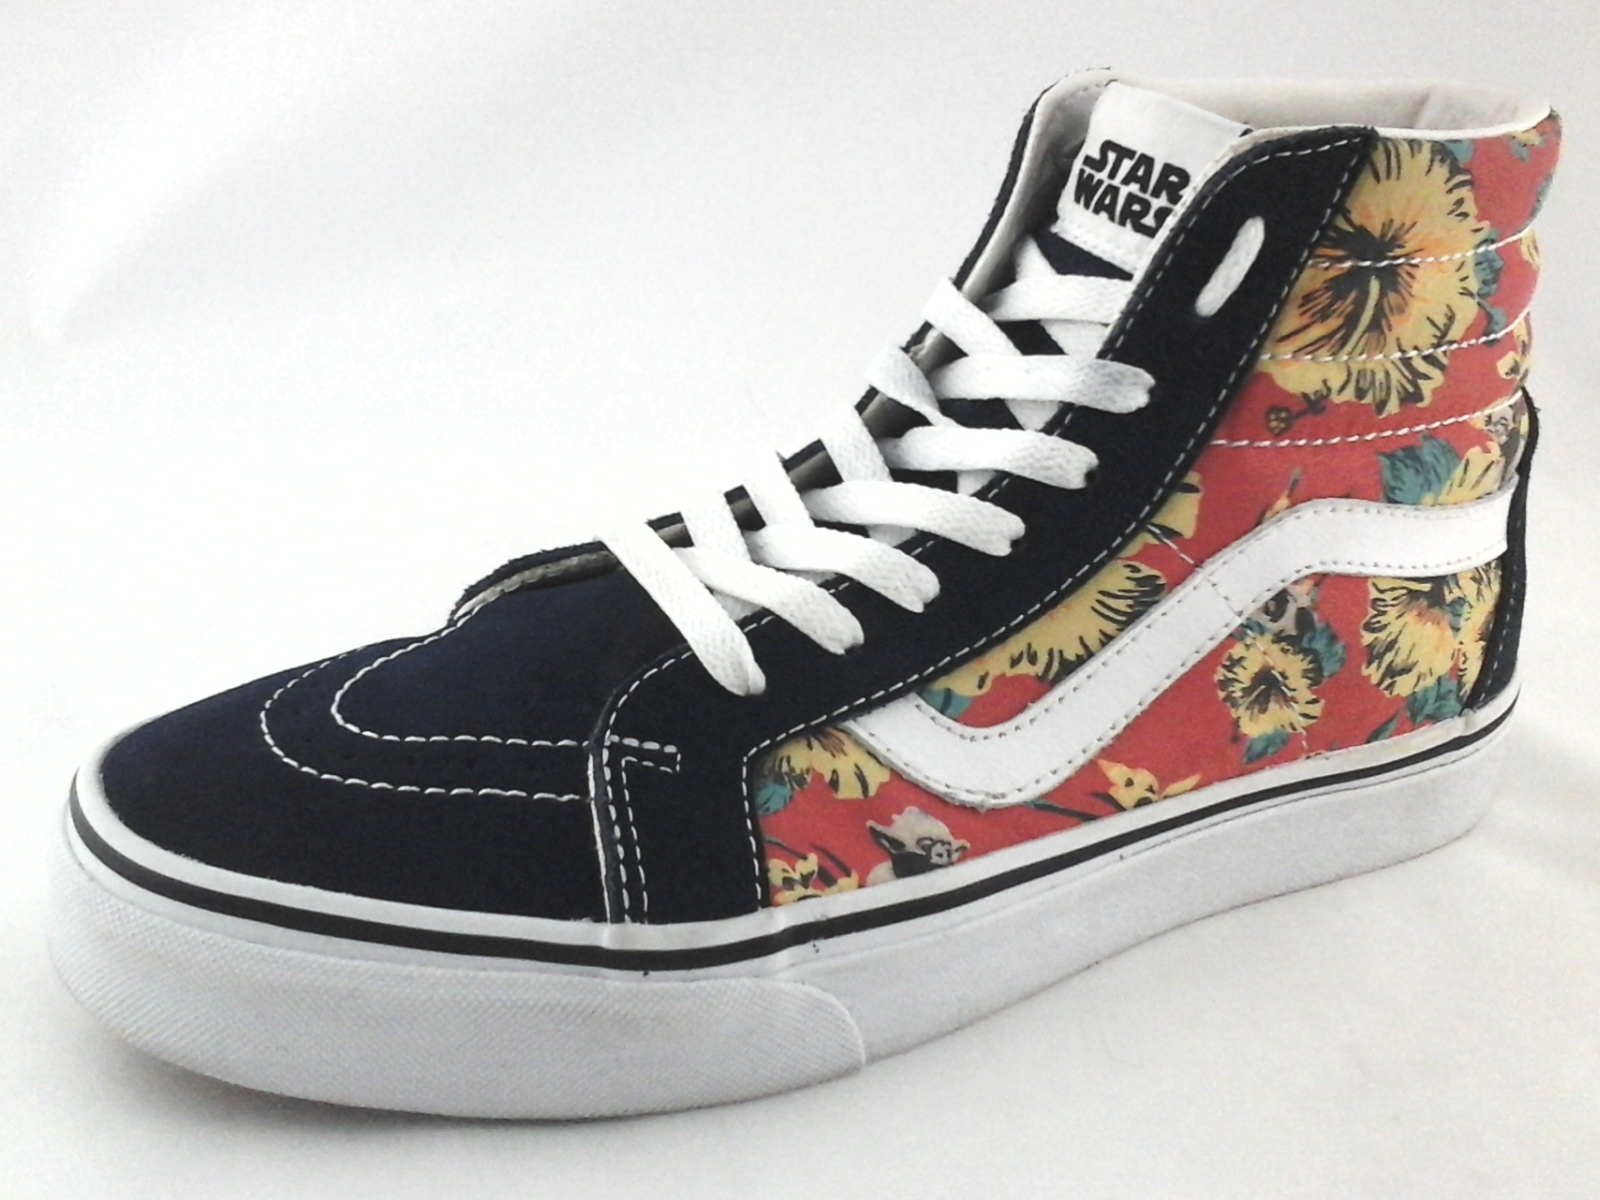 6695f42748ab96 VANS x Star Wars S8-Hi Sneakers Yoda Aloha Floral Shoes Men s US 9 Women s  10.5